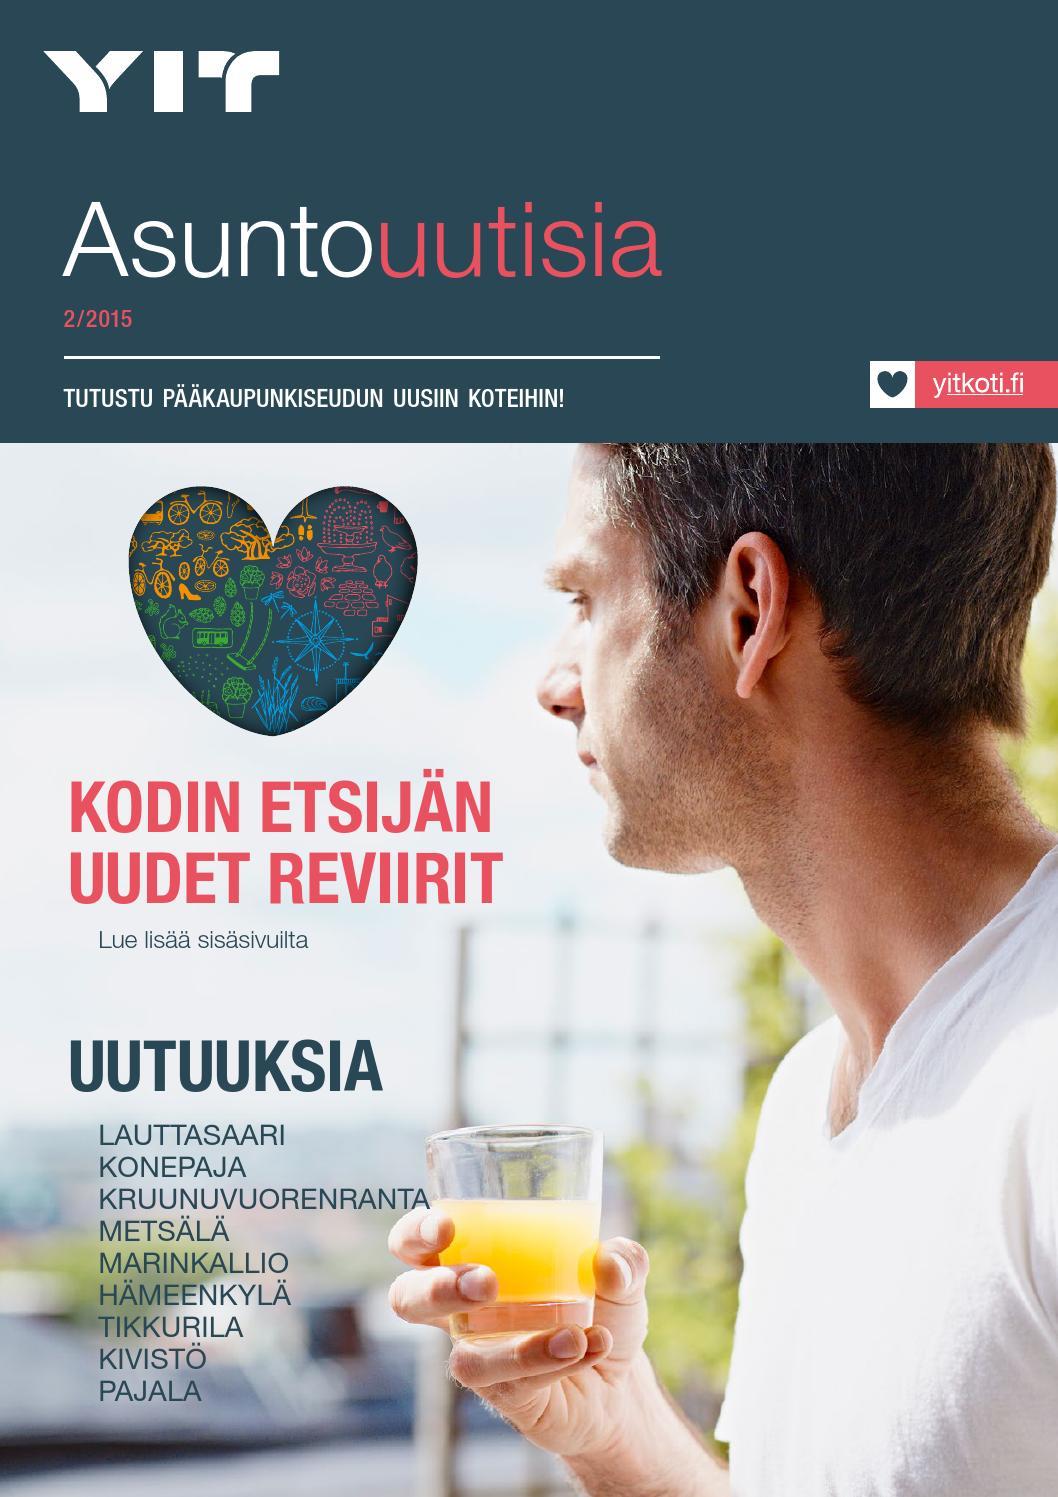 yit uudet asunnot Kalajoki